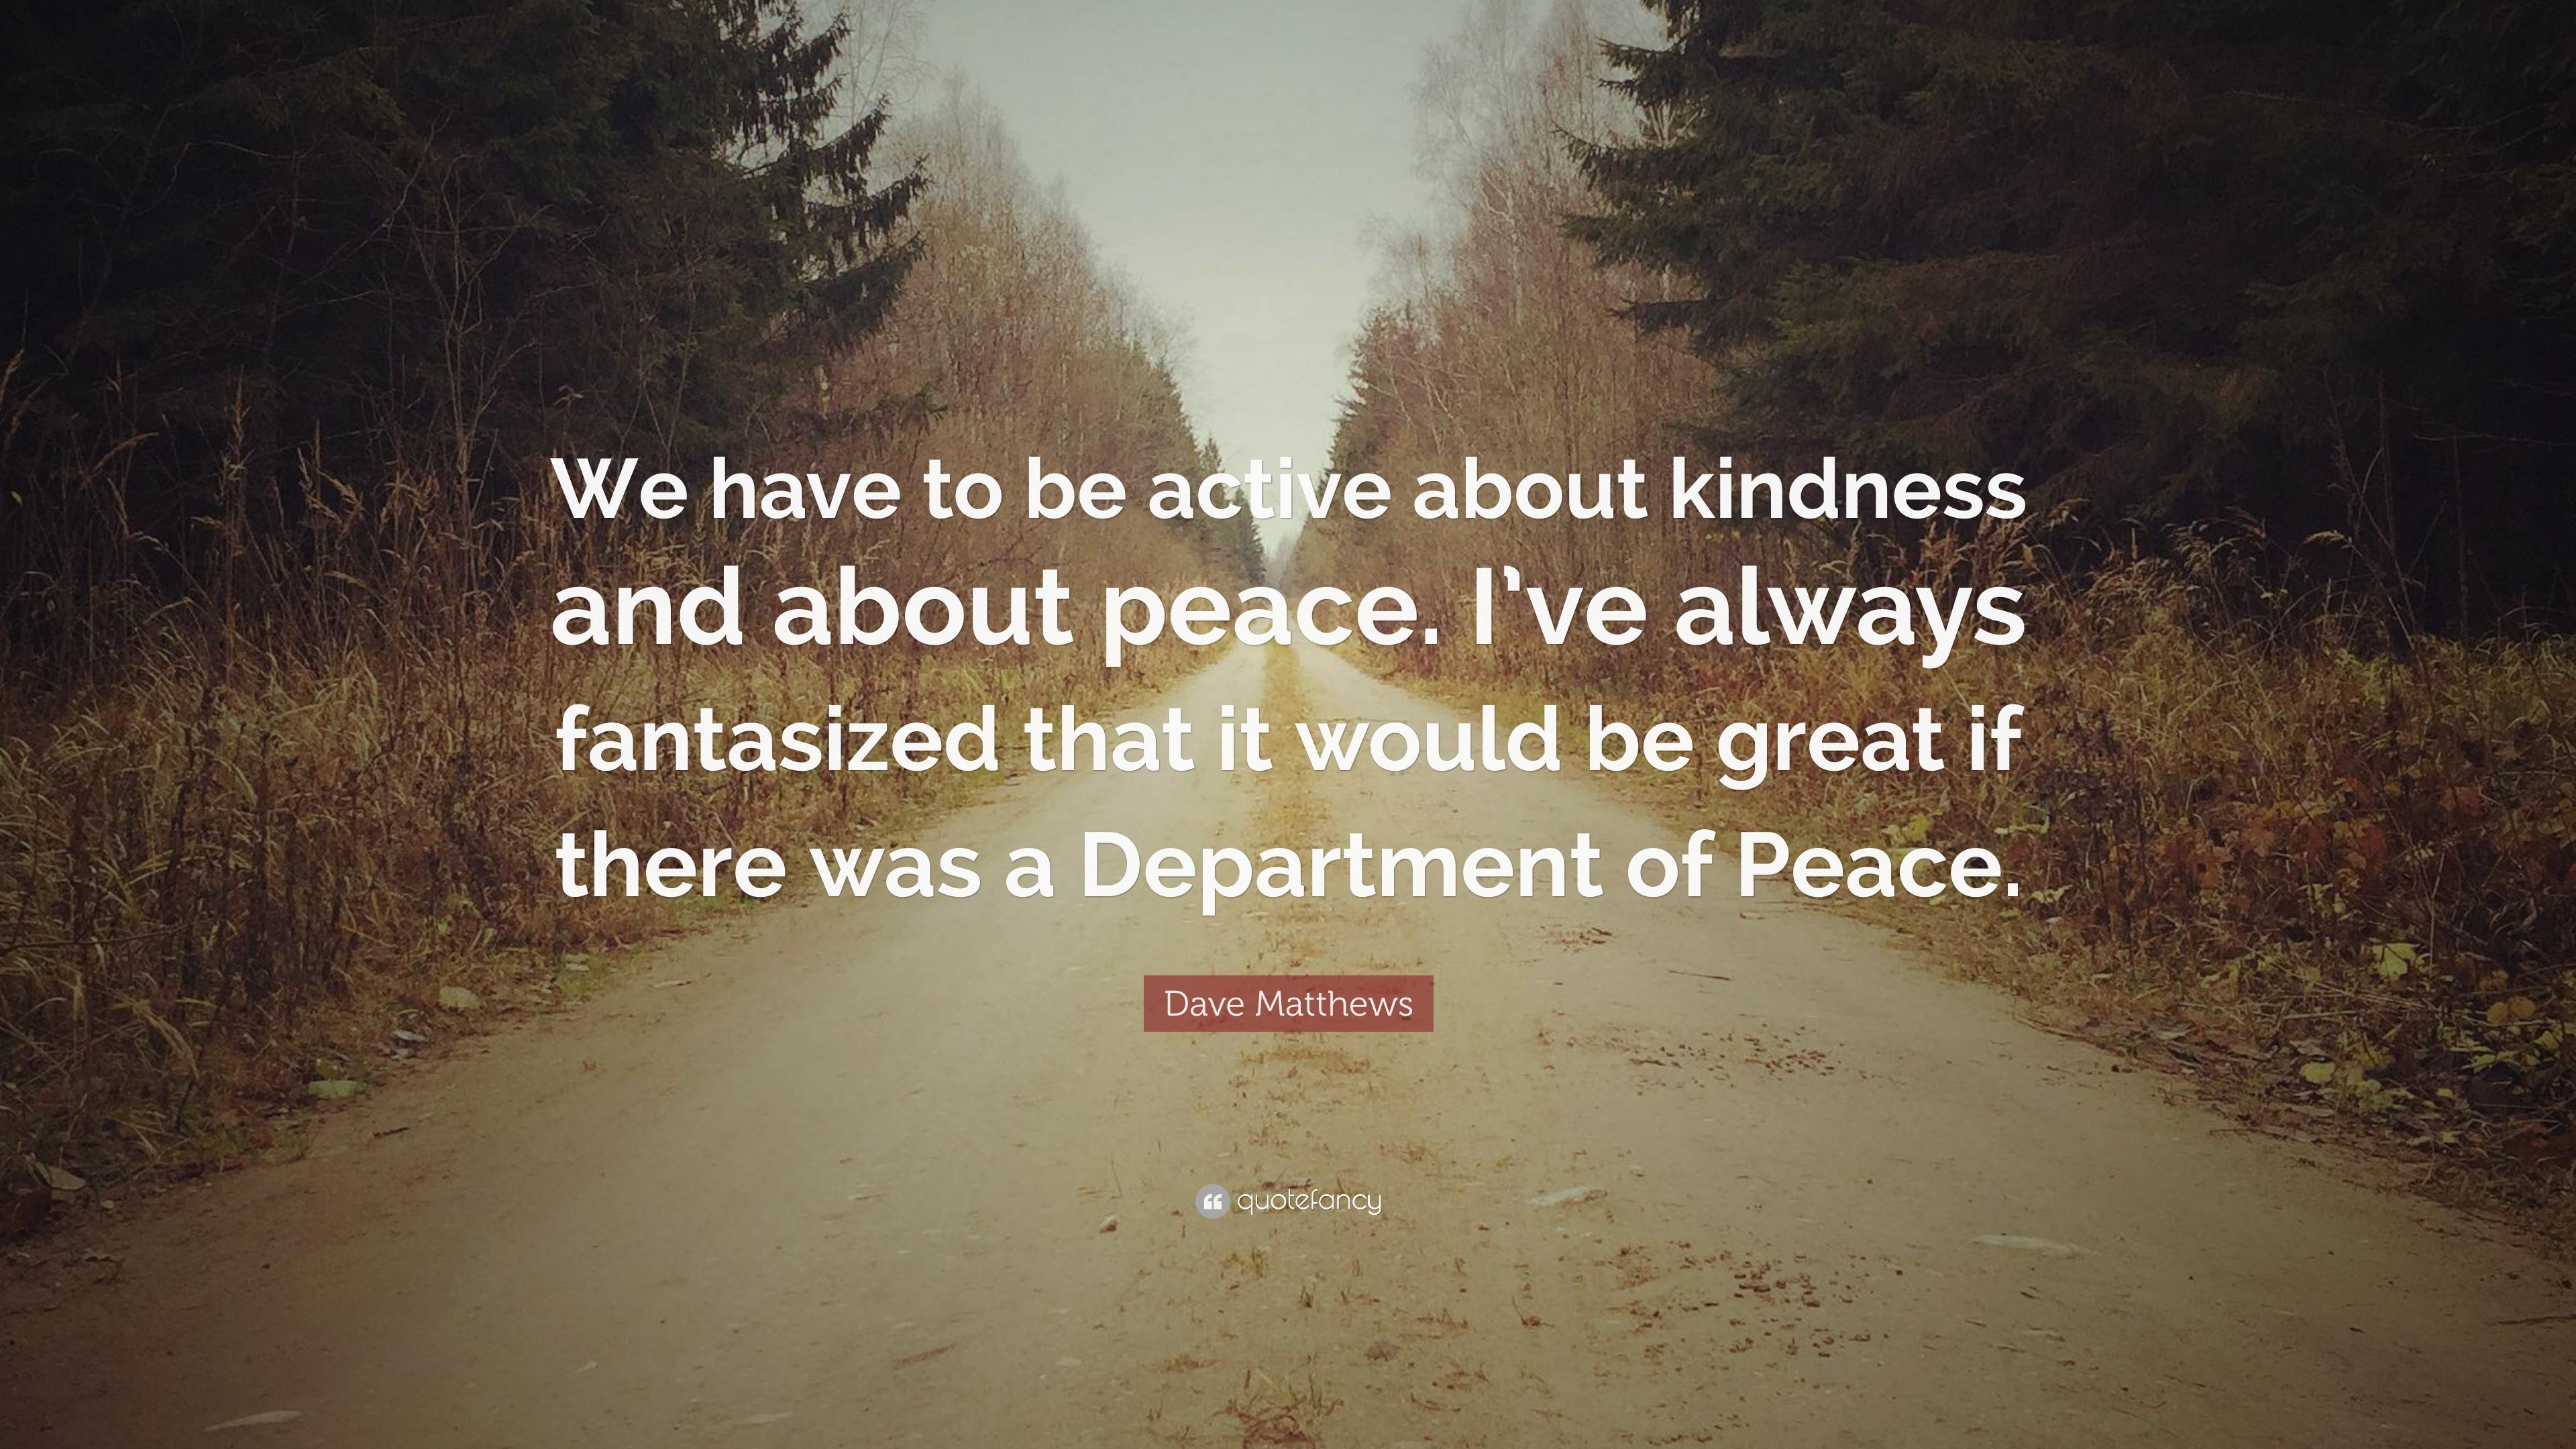 Dave Matthews Quotes | Quotes